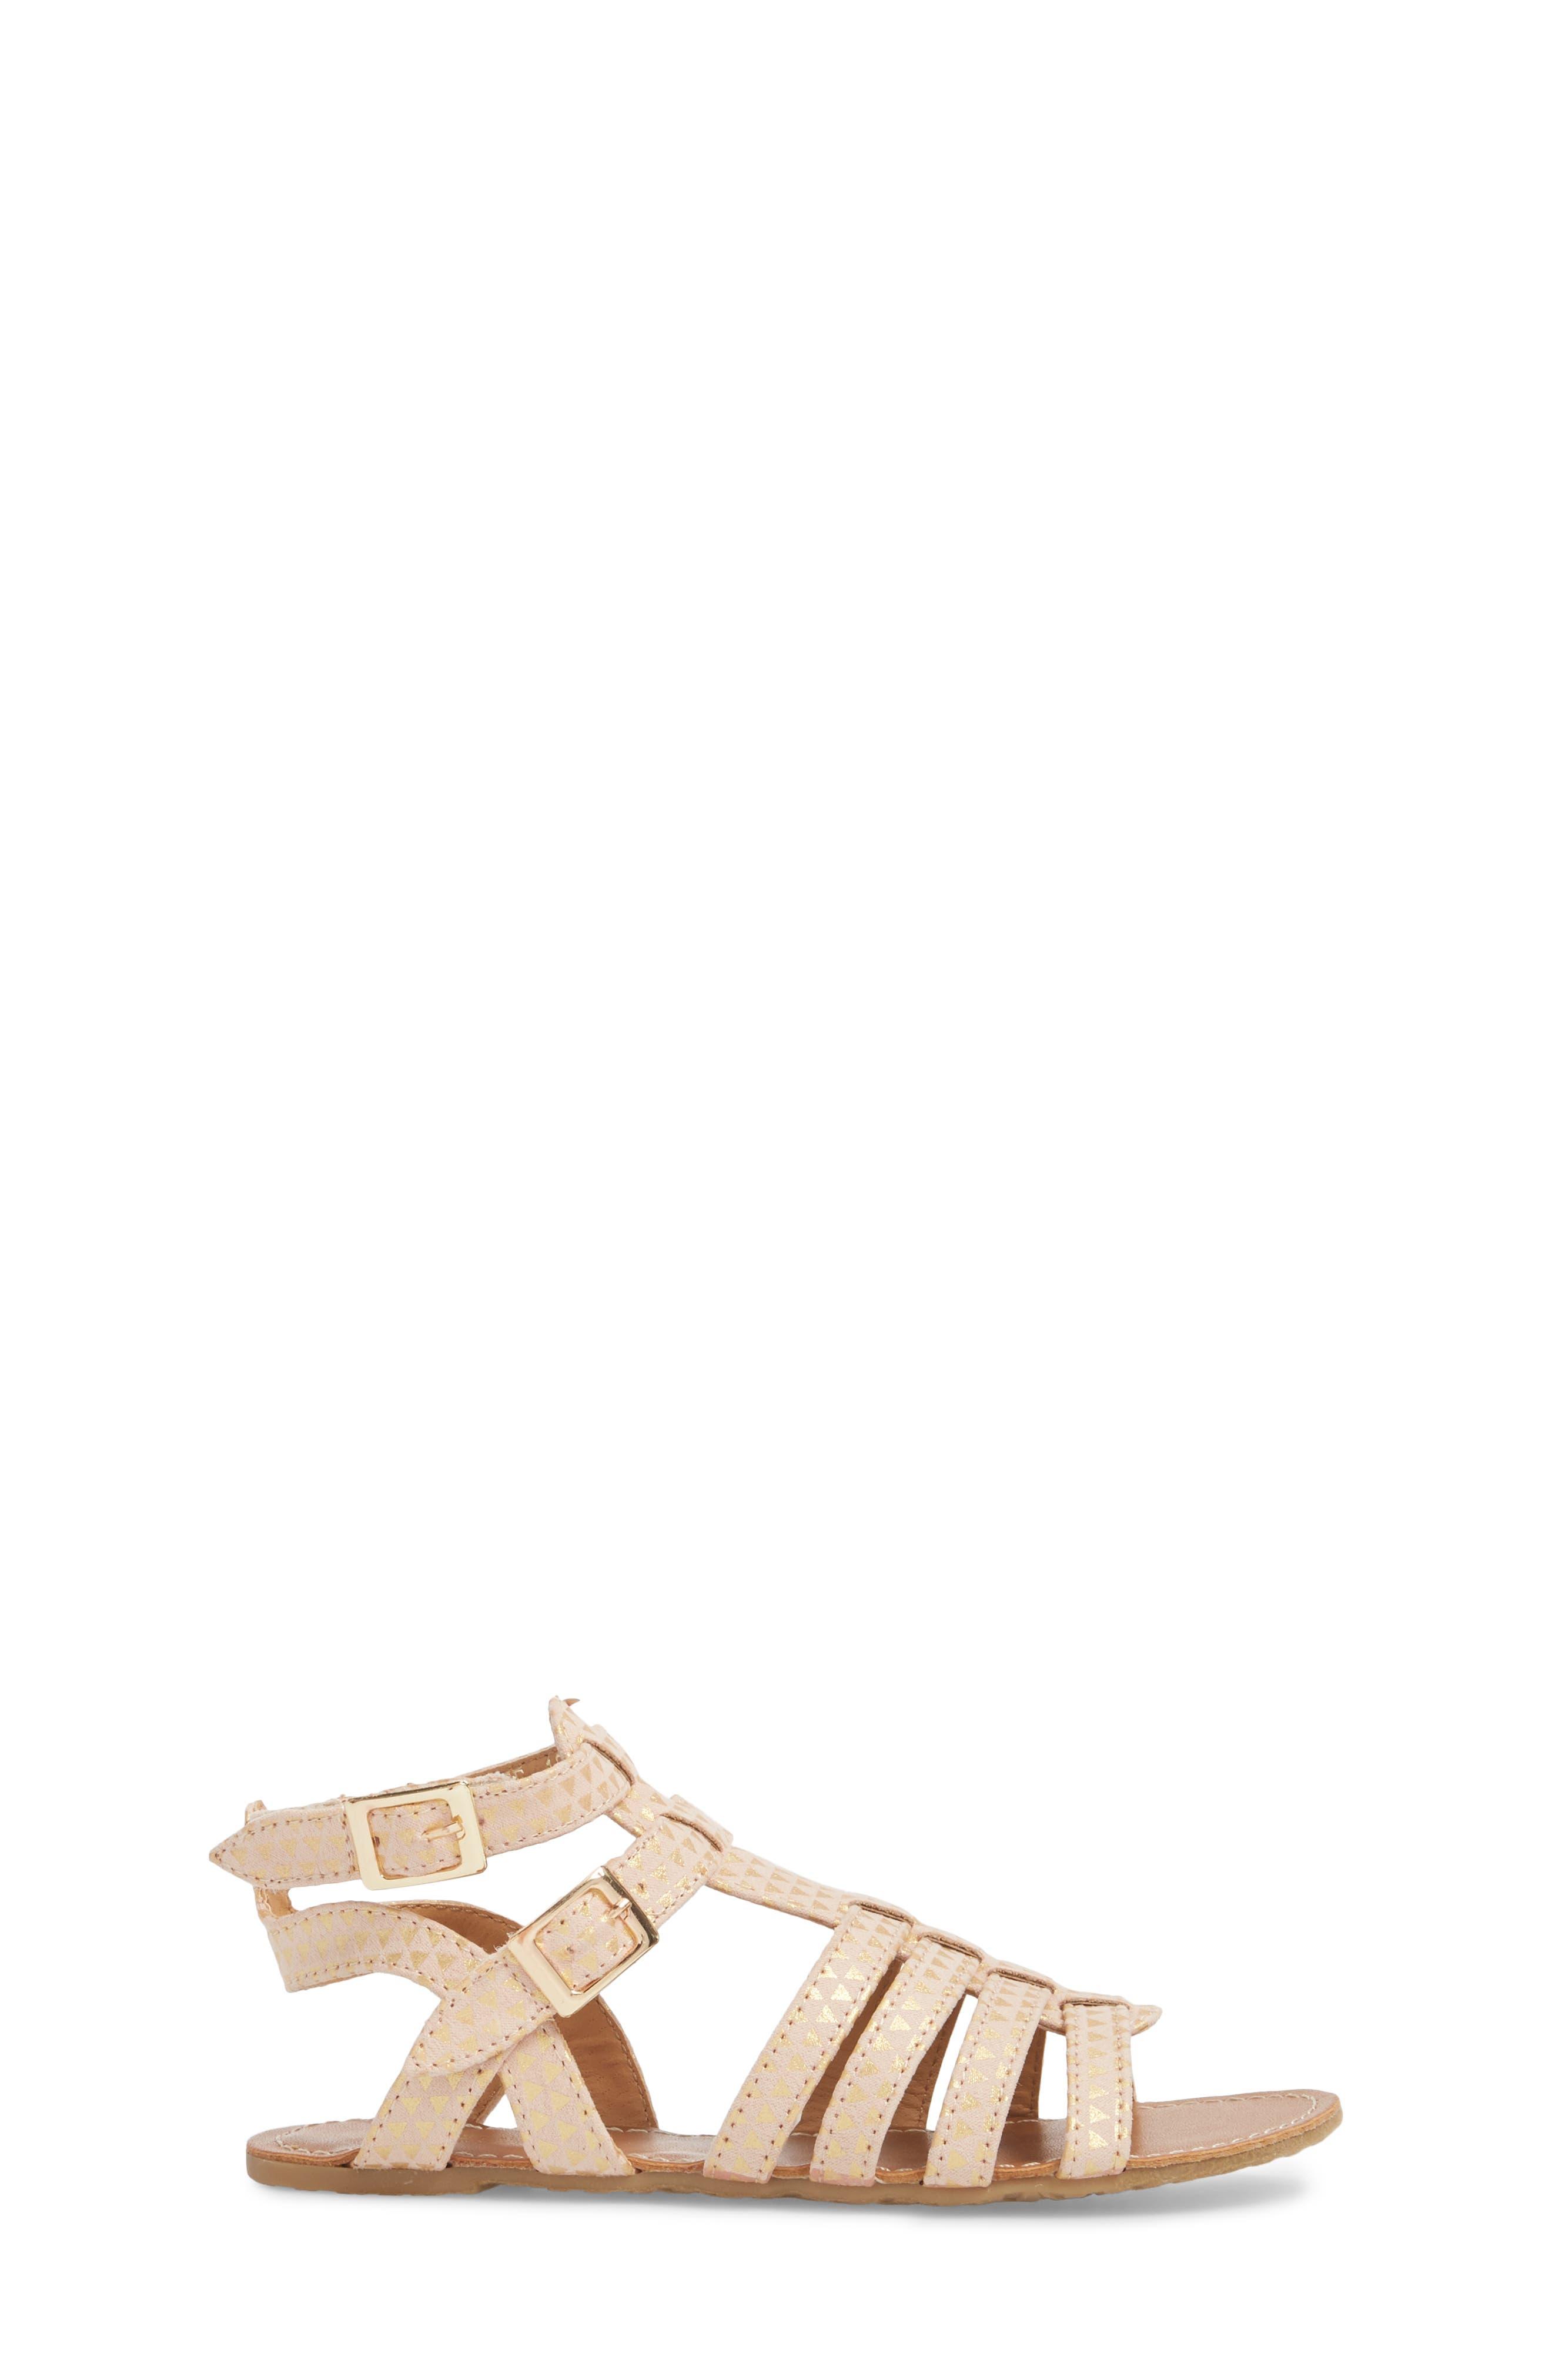 Kiera Bite Metallic Sandal,                             Alternate thumbnail 3, color,                             Gold